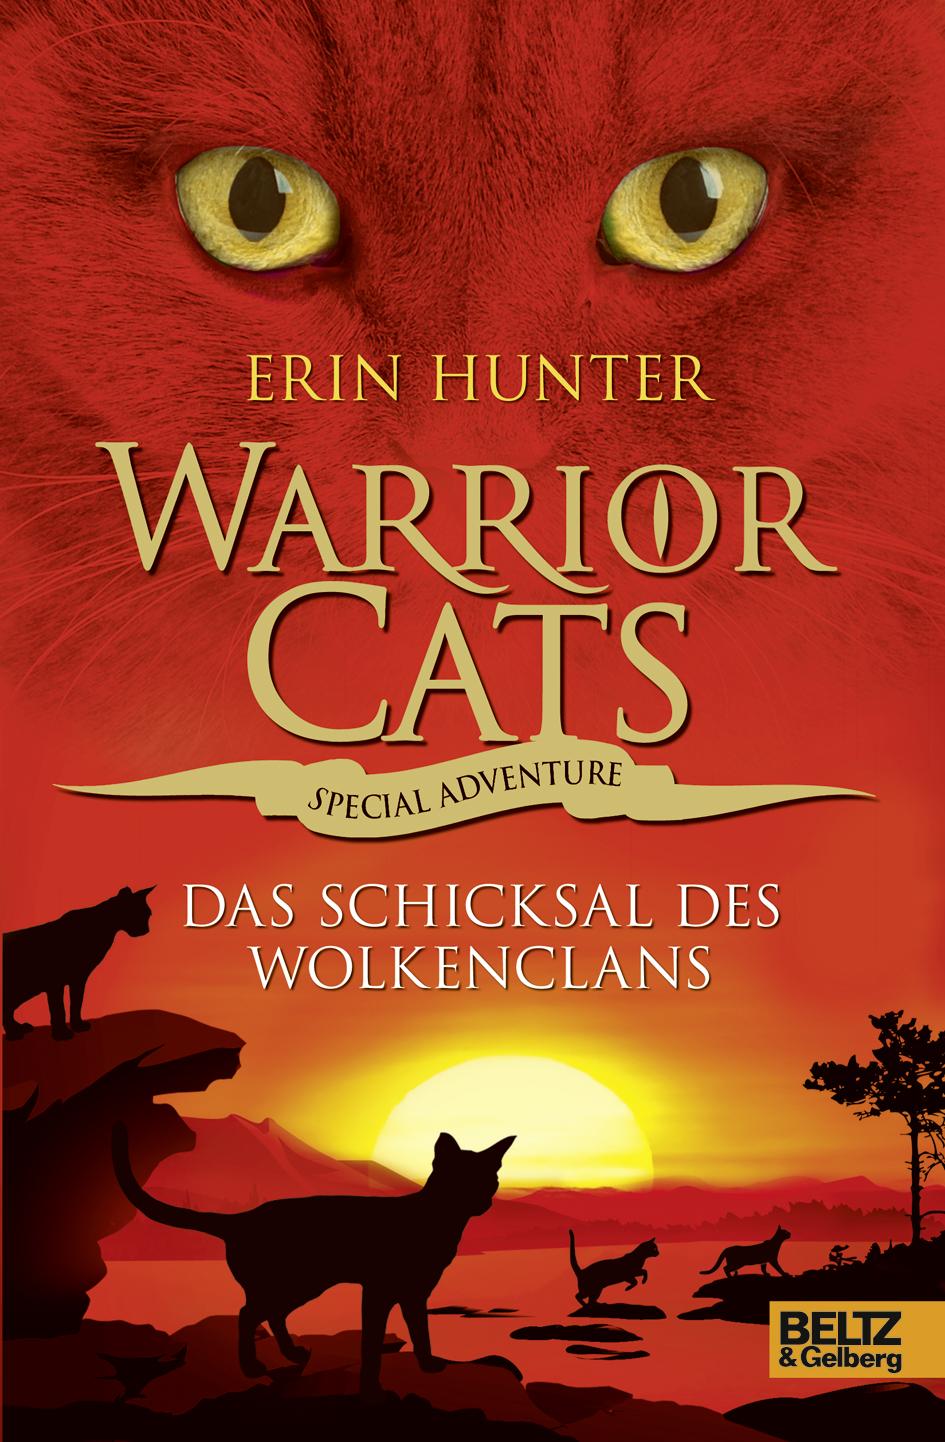 Warrior Cats Reihenfolge Special Adventure